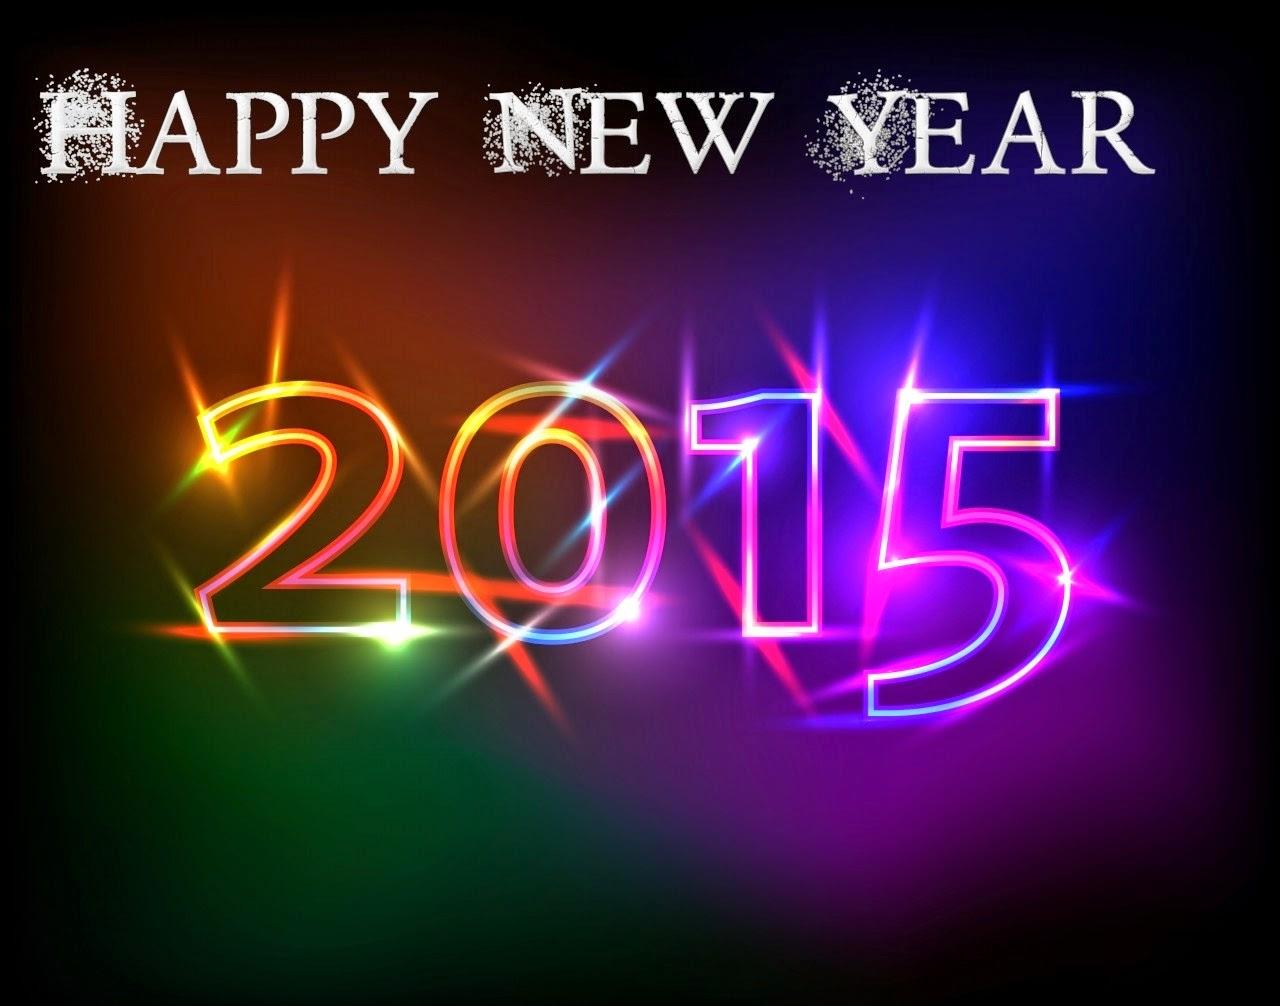 Happy New Year 2015 Love Wallpaper